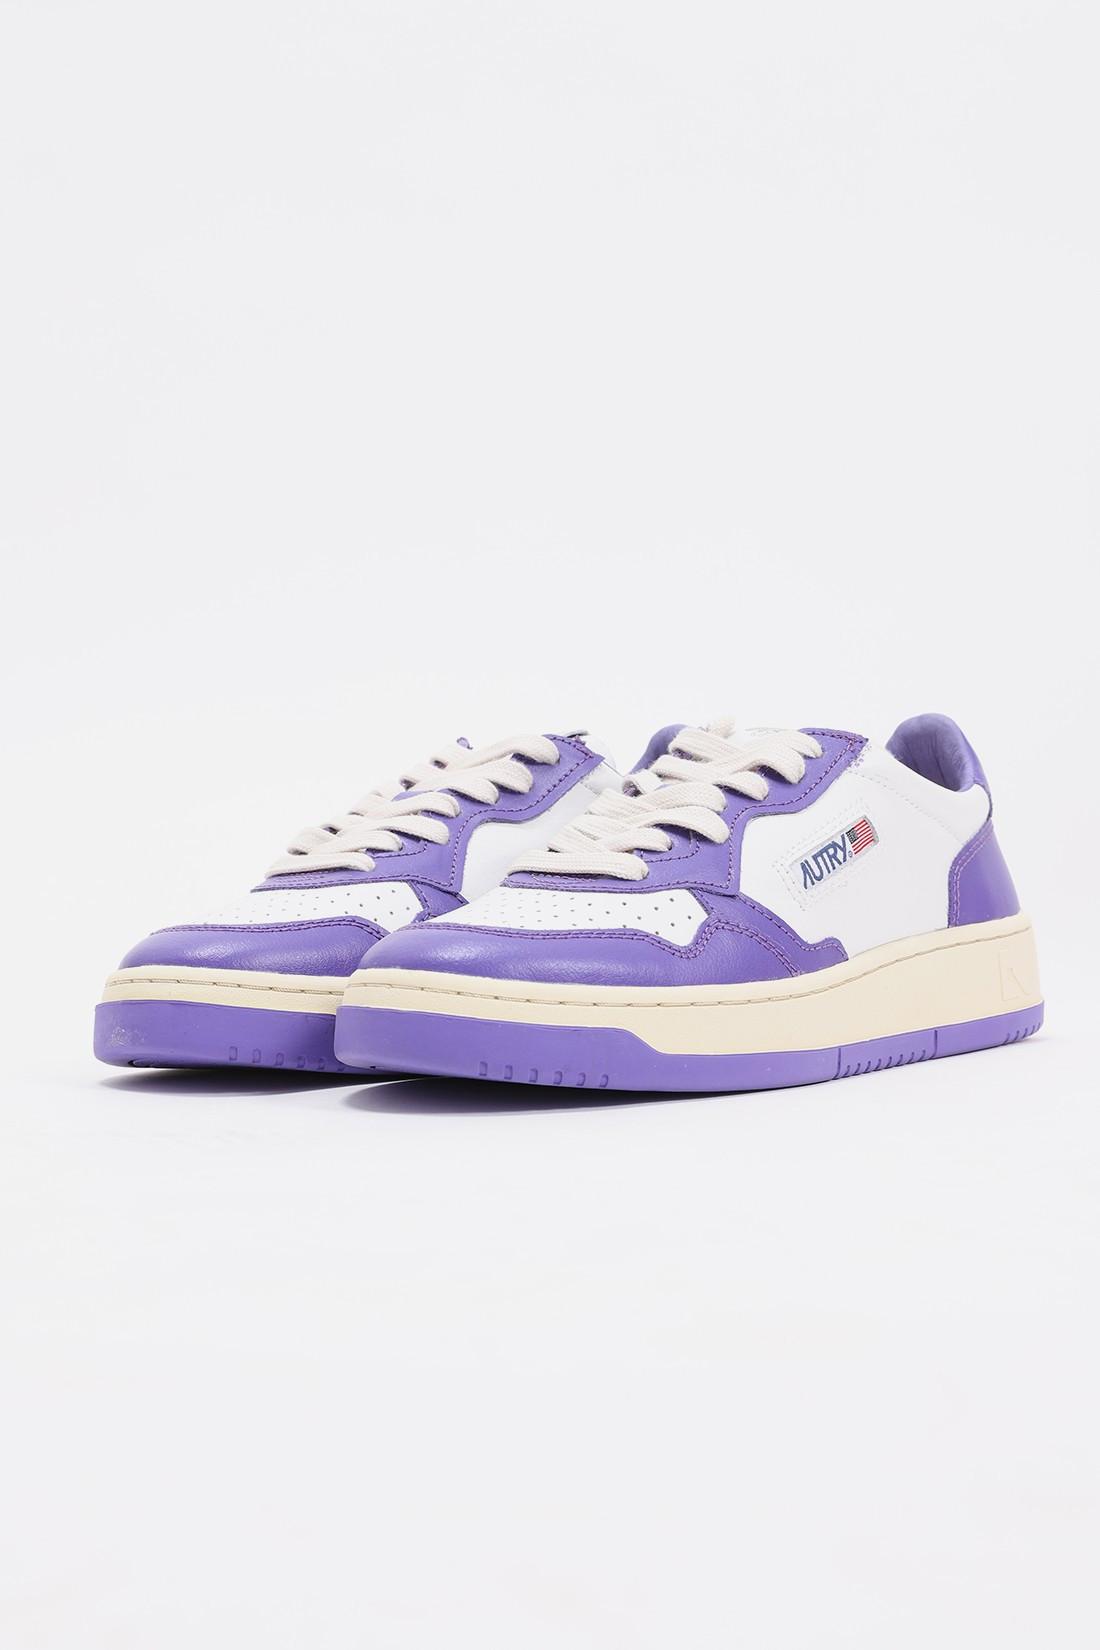 AUTRY / Autry White/purple